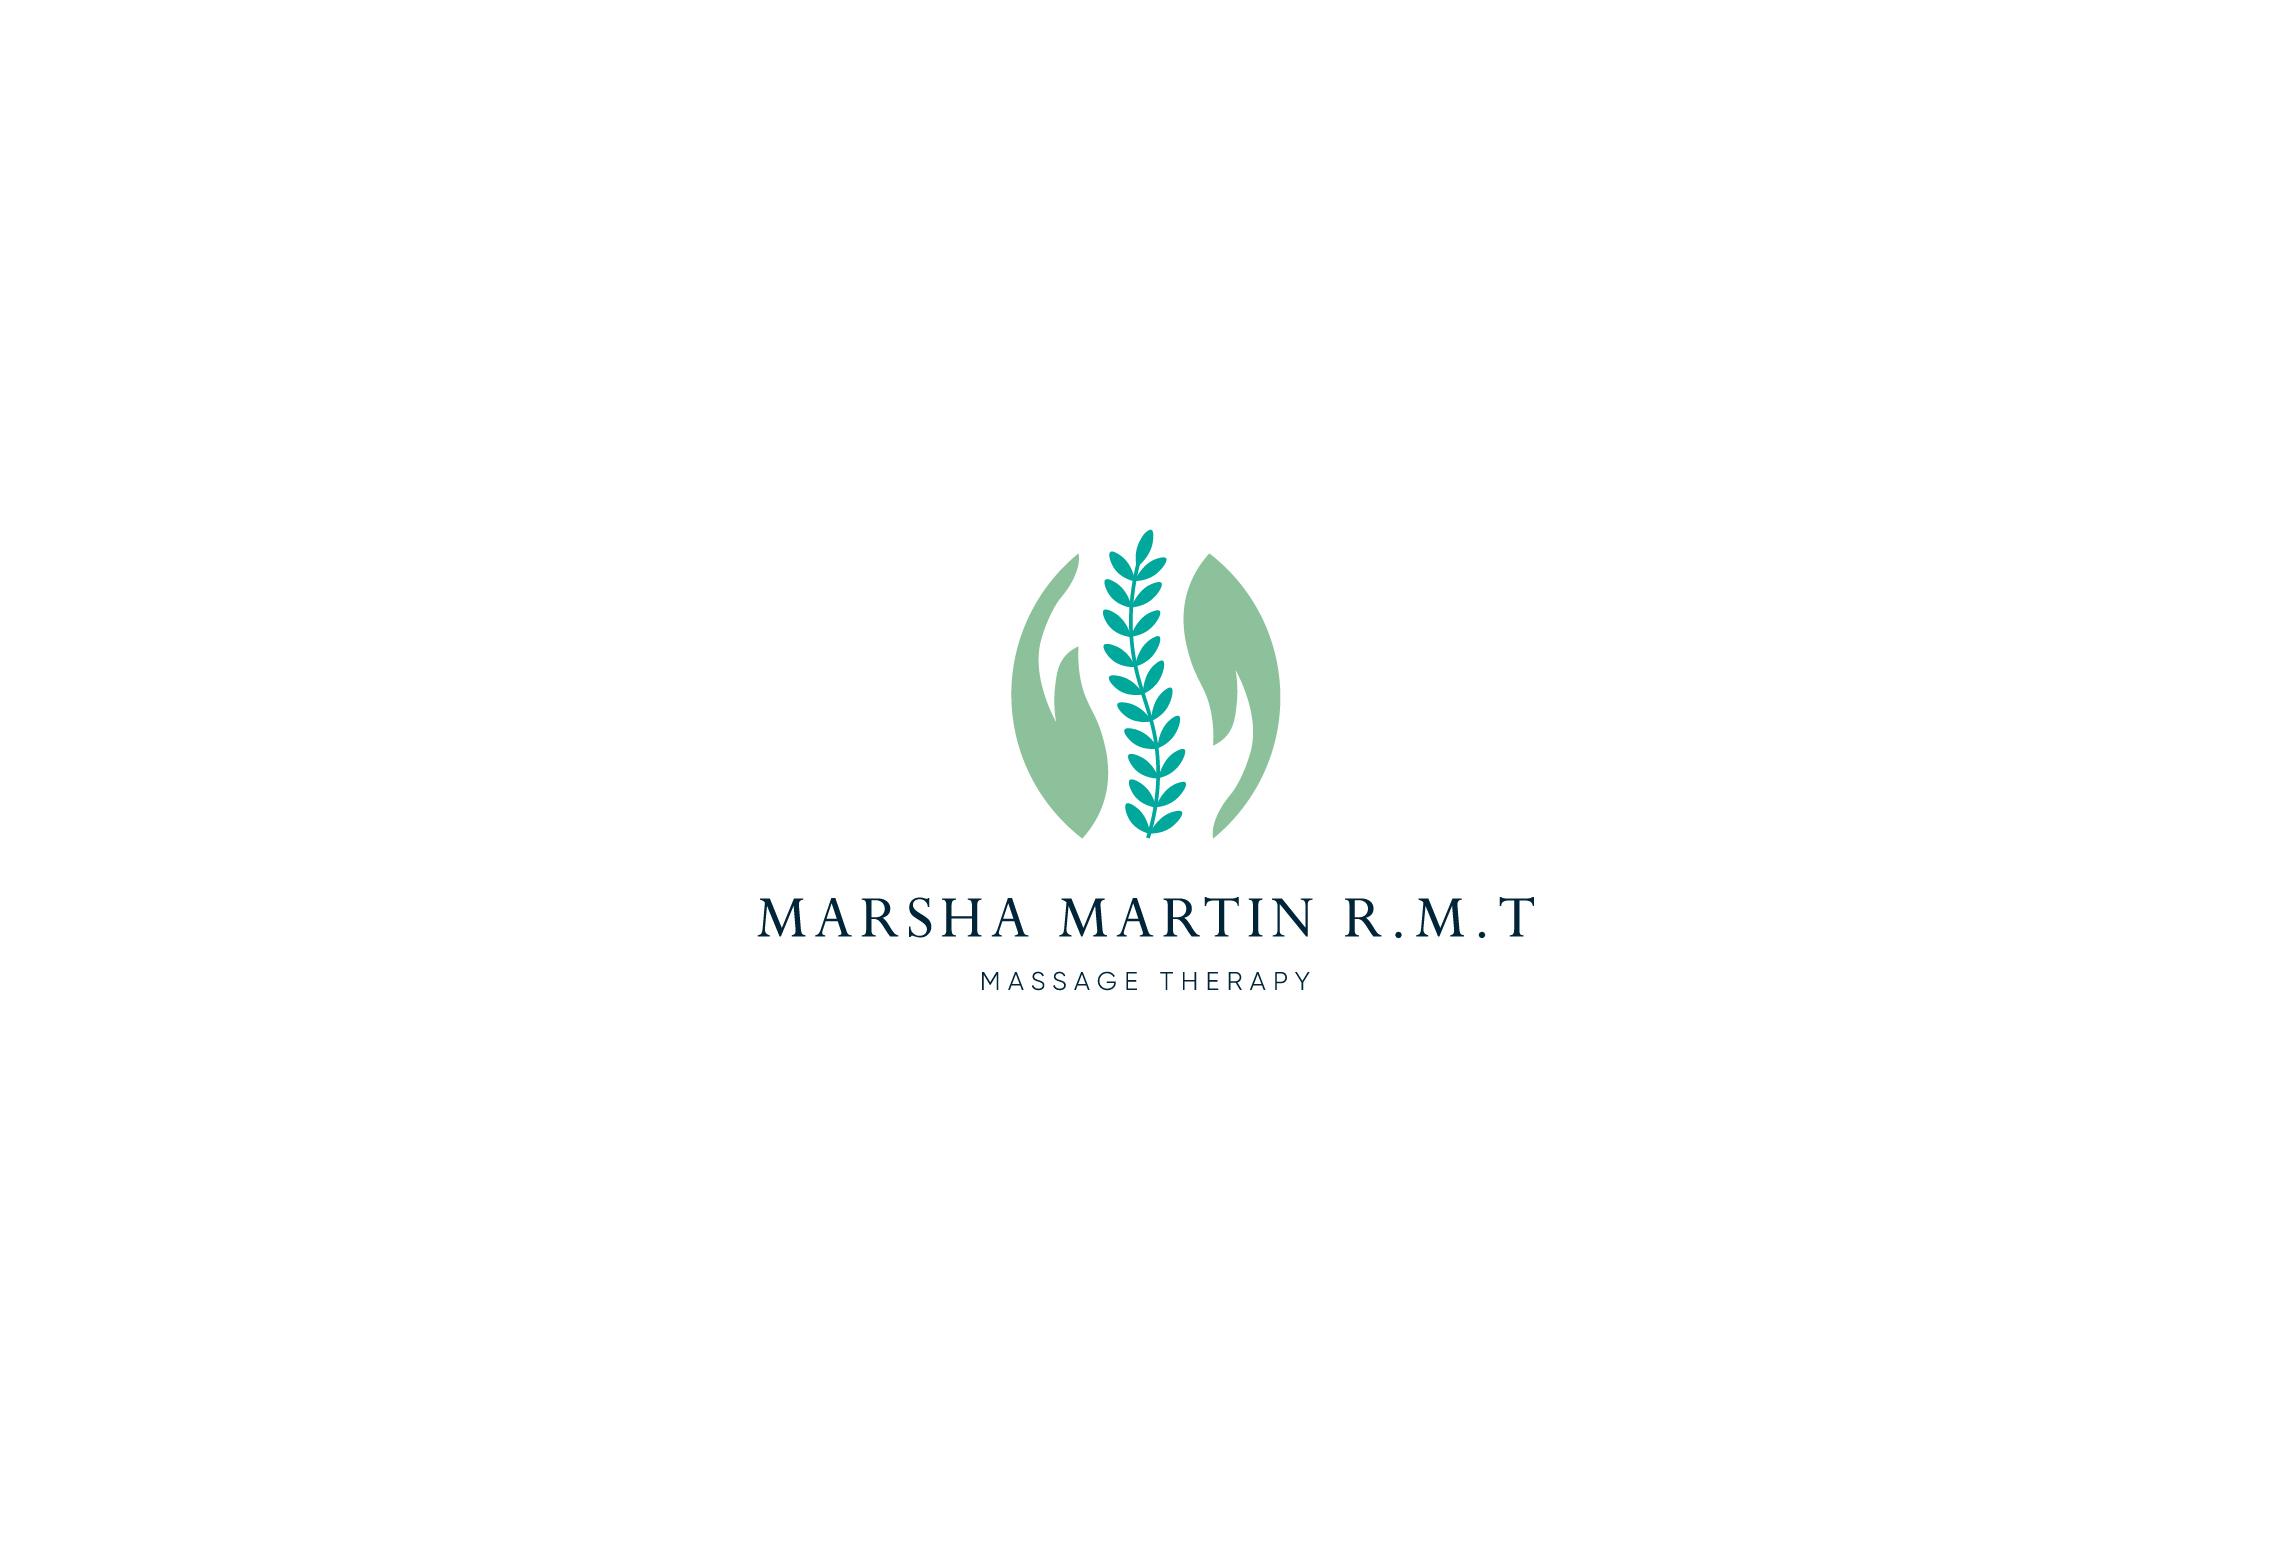 Marsha Martin RMT